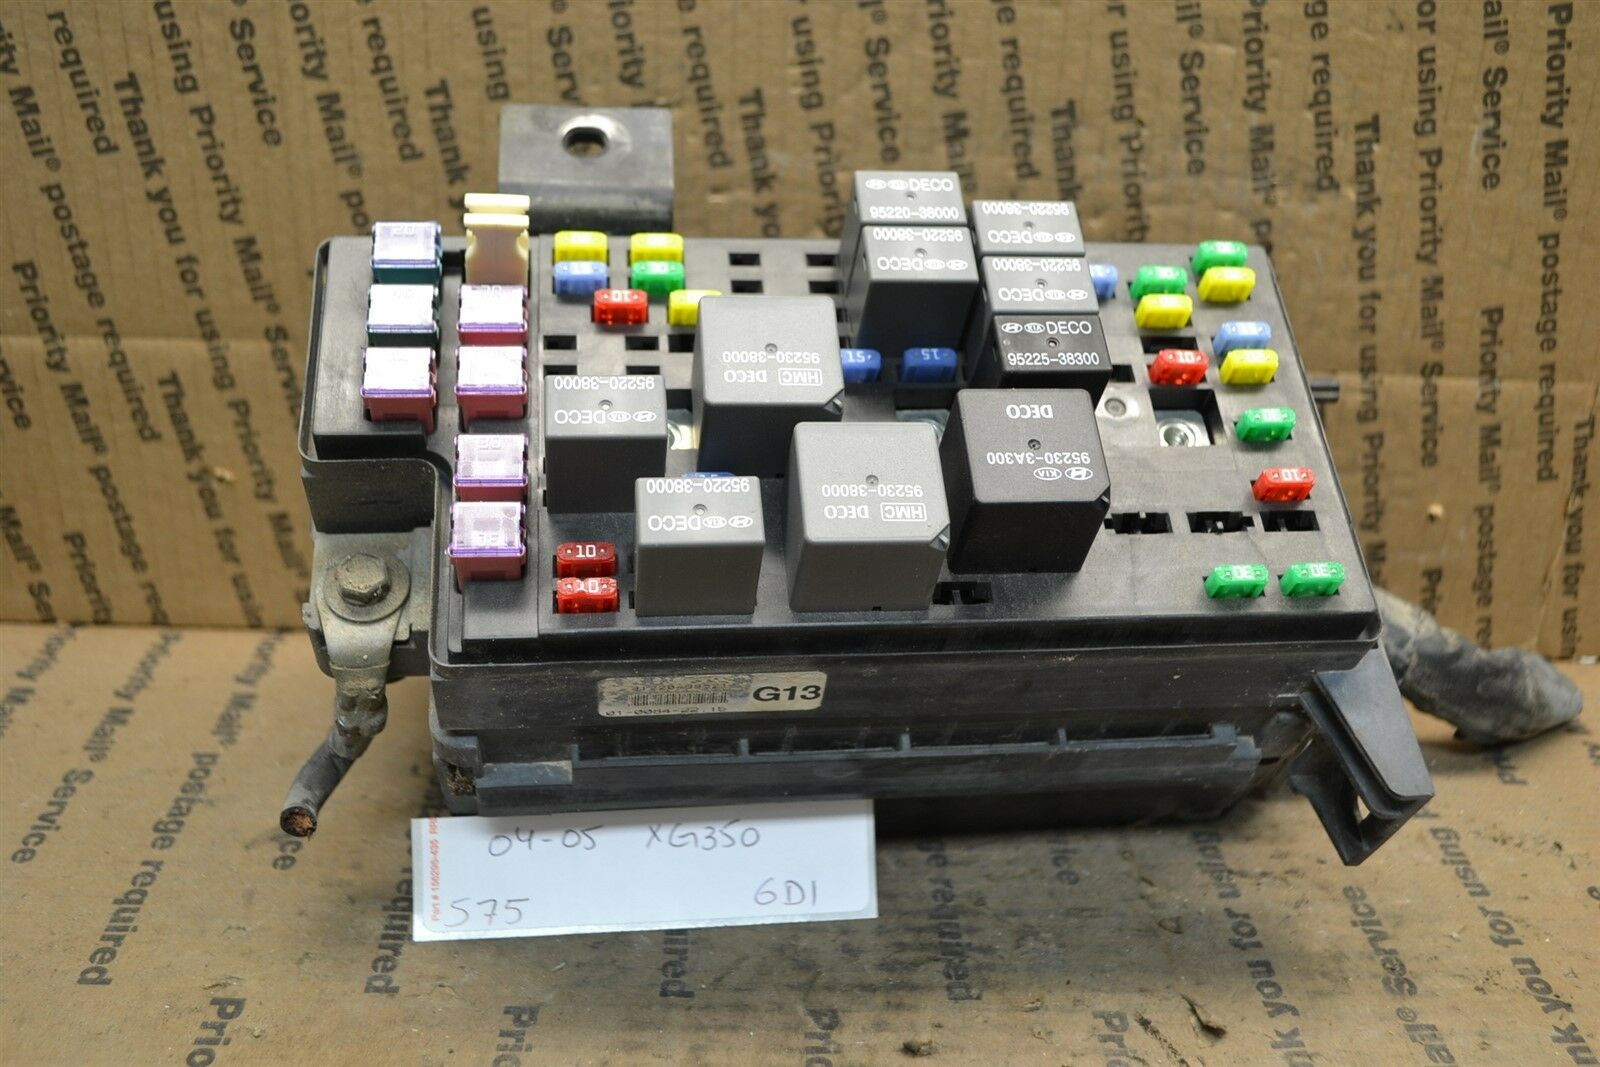 2004 2005 hyundai xg350 fuse box junction oem 9122039521 module 575 6d1 [ 1600 x 1067 Pixel ]